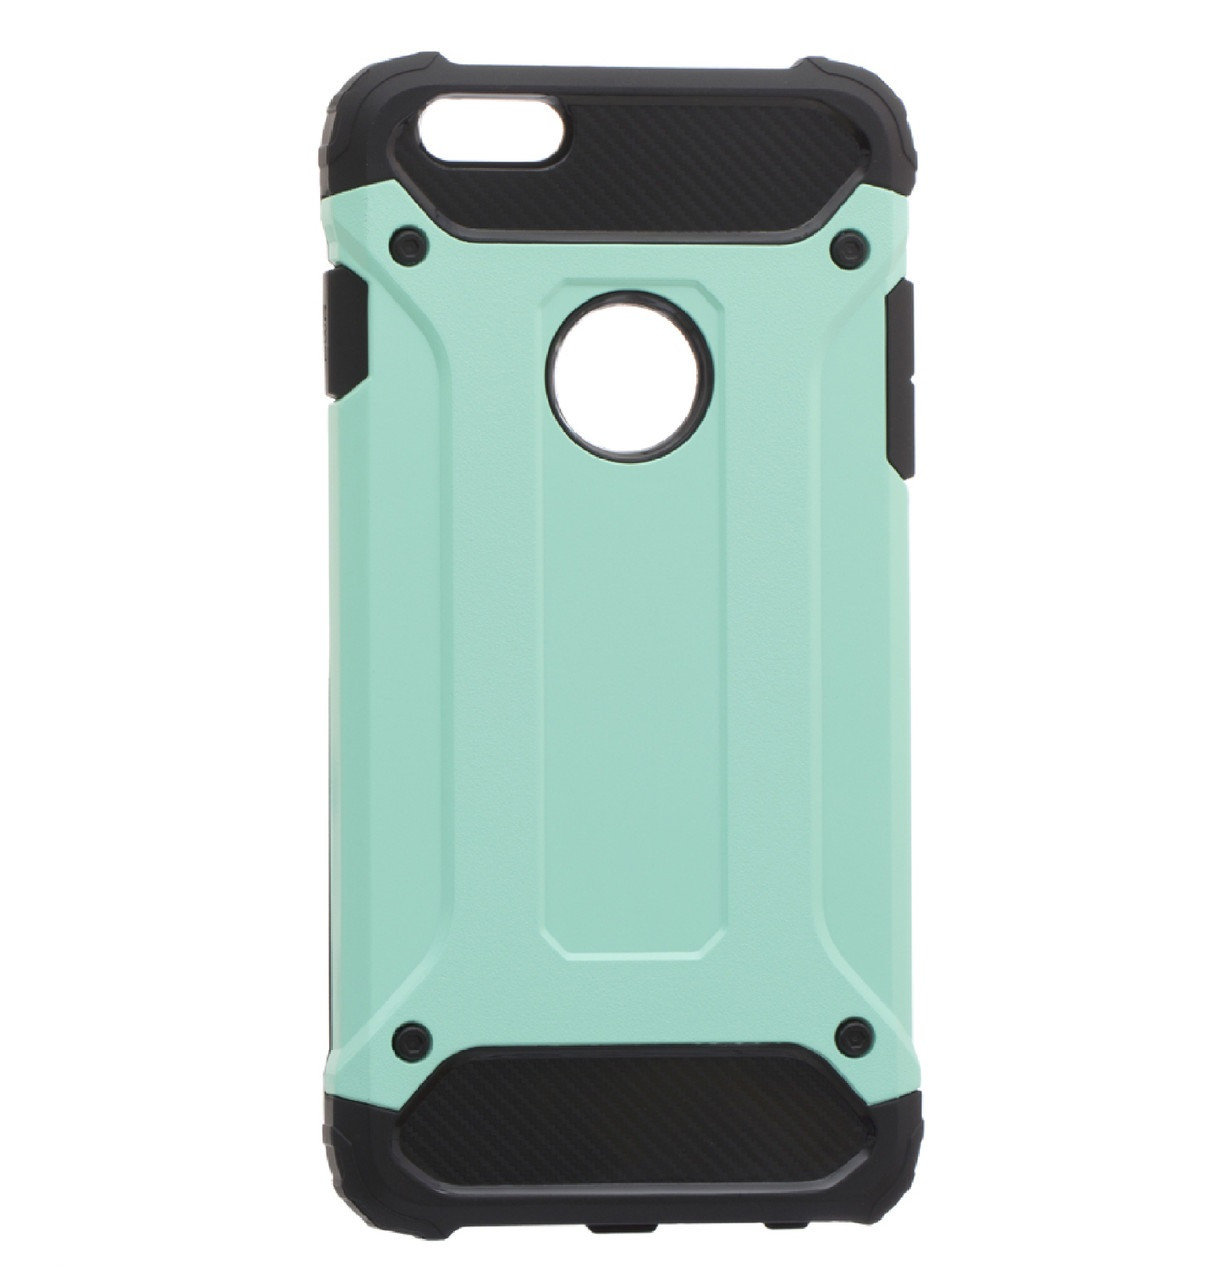 Бронированный противоударный TPU+PC чехол IMMORTAL для IPhone 6 Plus / 6s Plus Turquoise